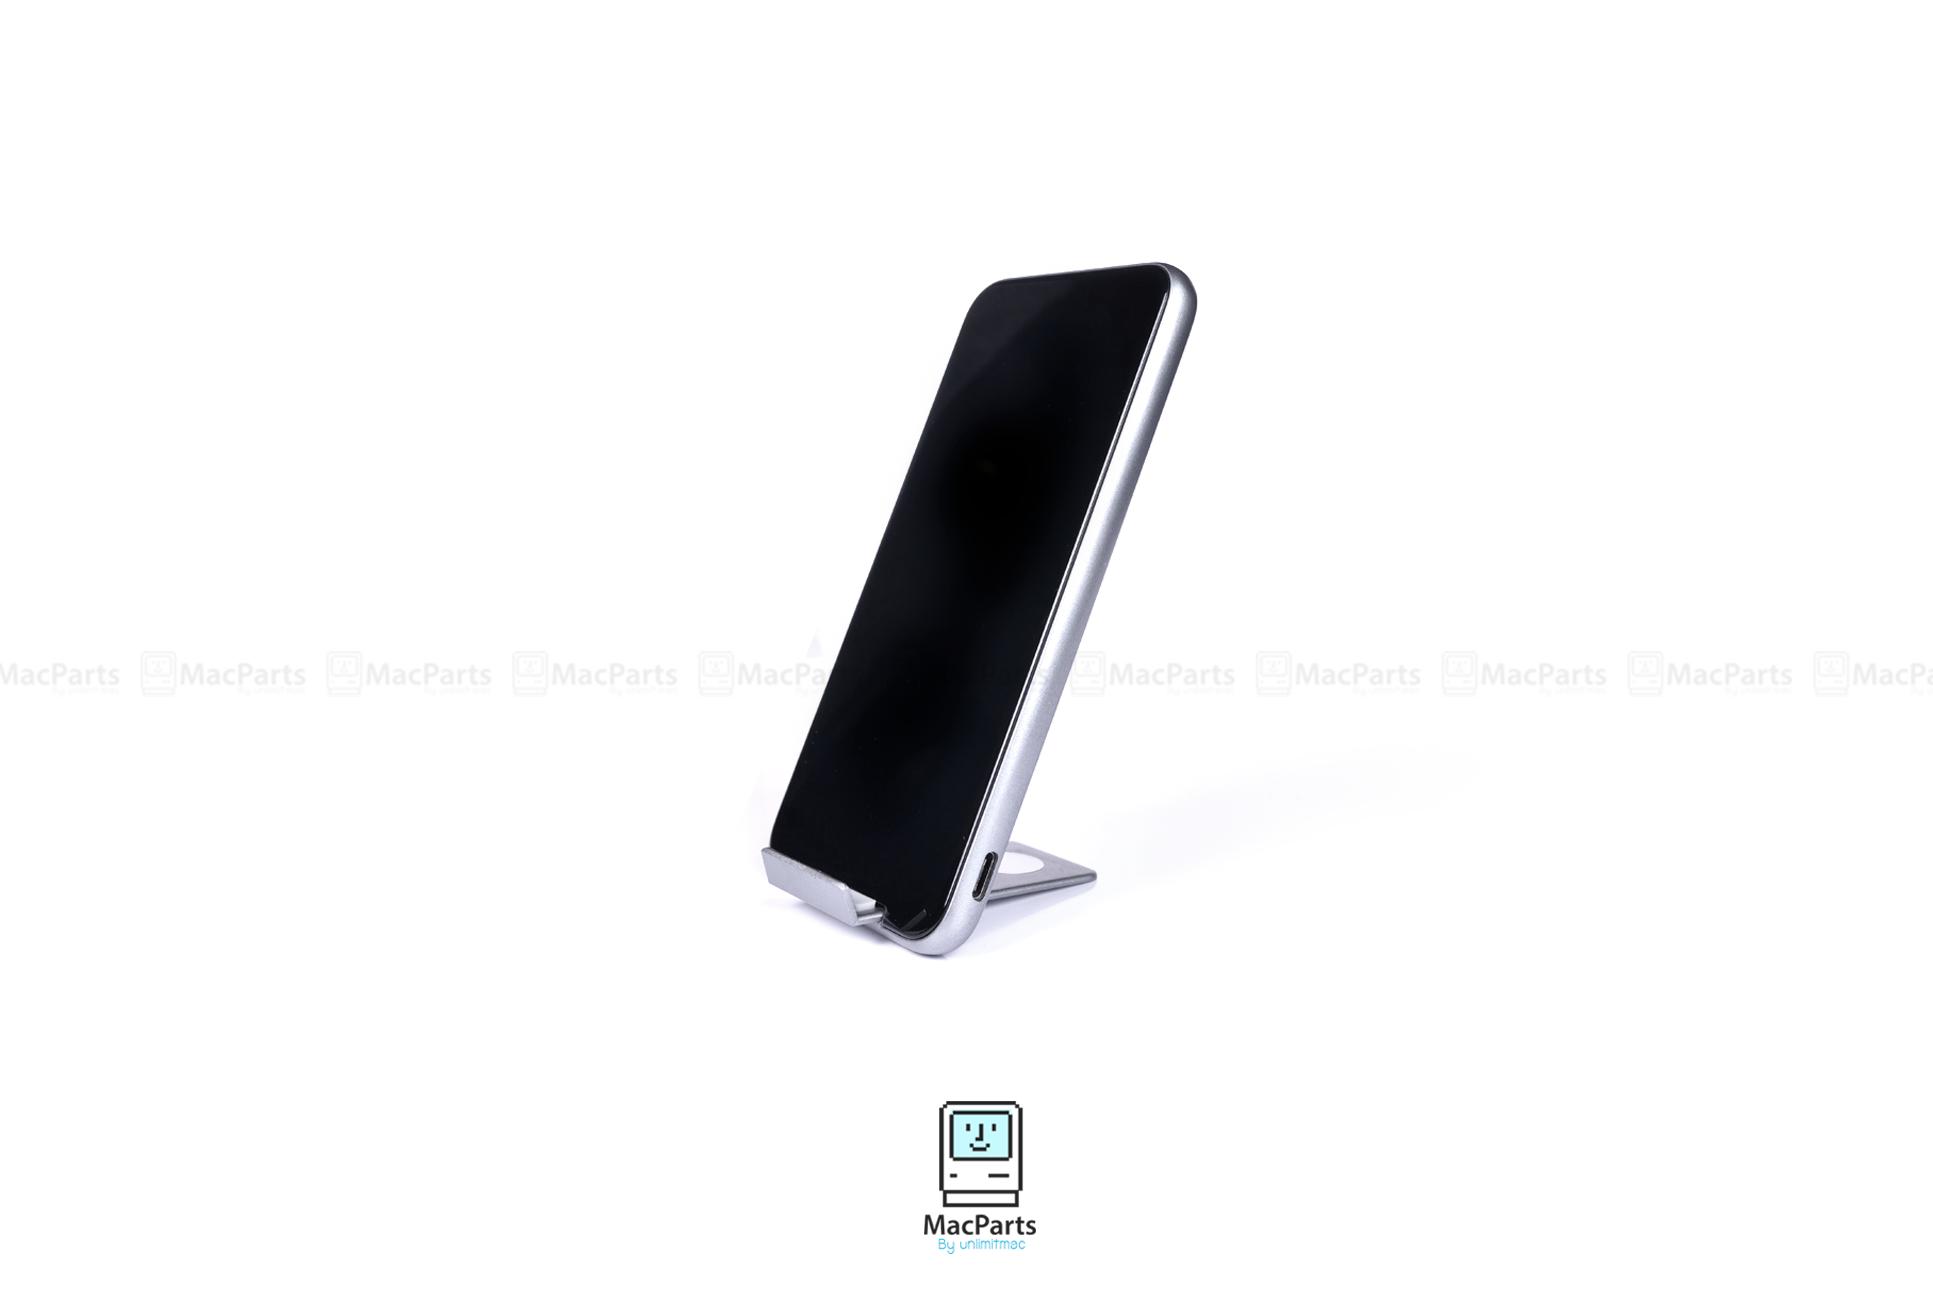 Wireless Charger Desktop Holder For iPhoneX / iPhone 8 / iPhone 8 Plus อุปกรณ์ชาร์ทไฟไร้สาย